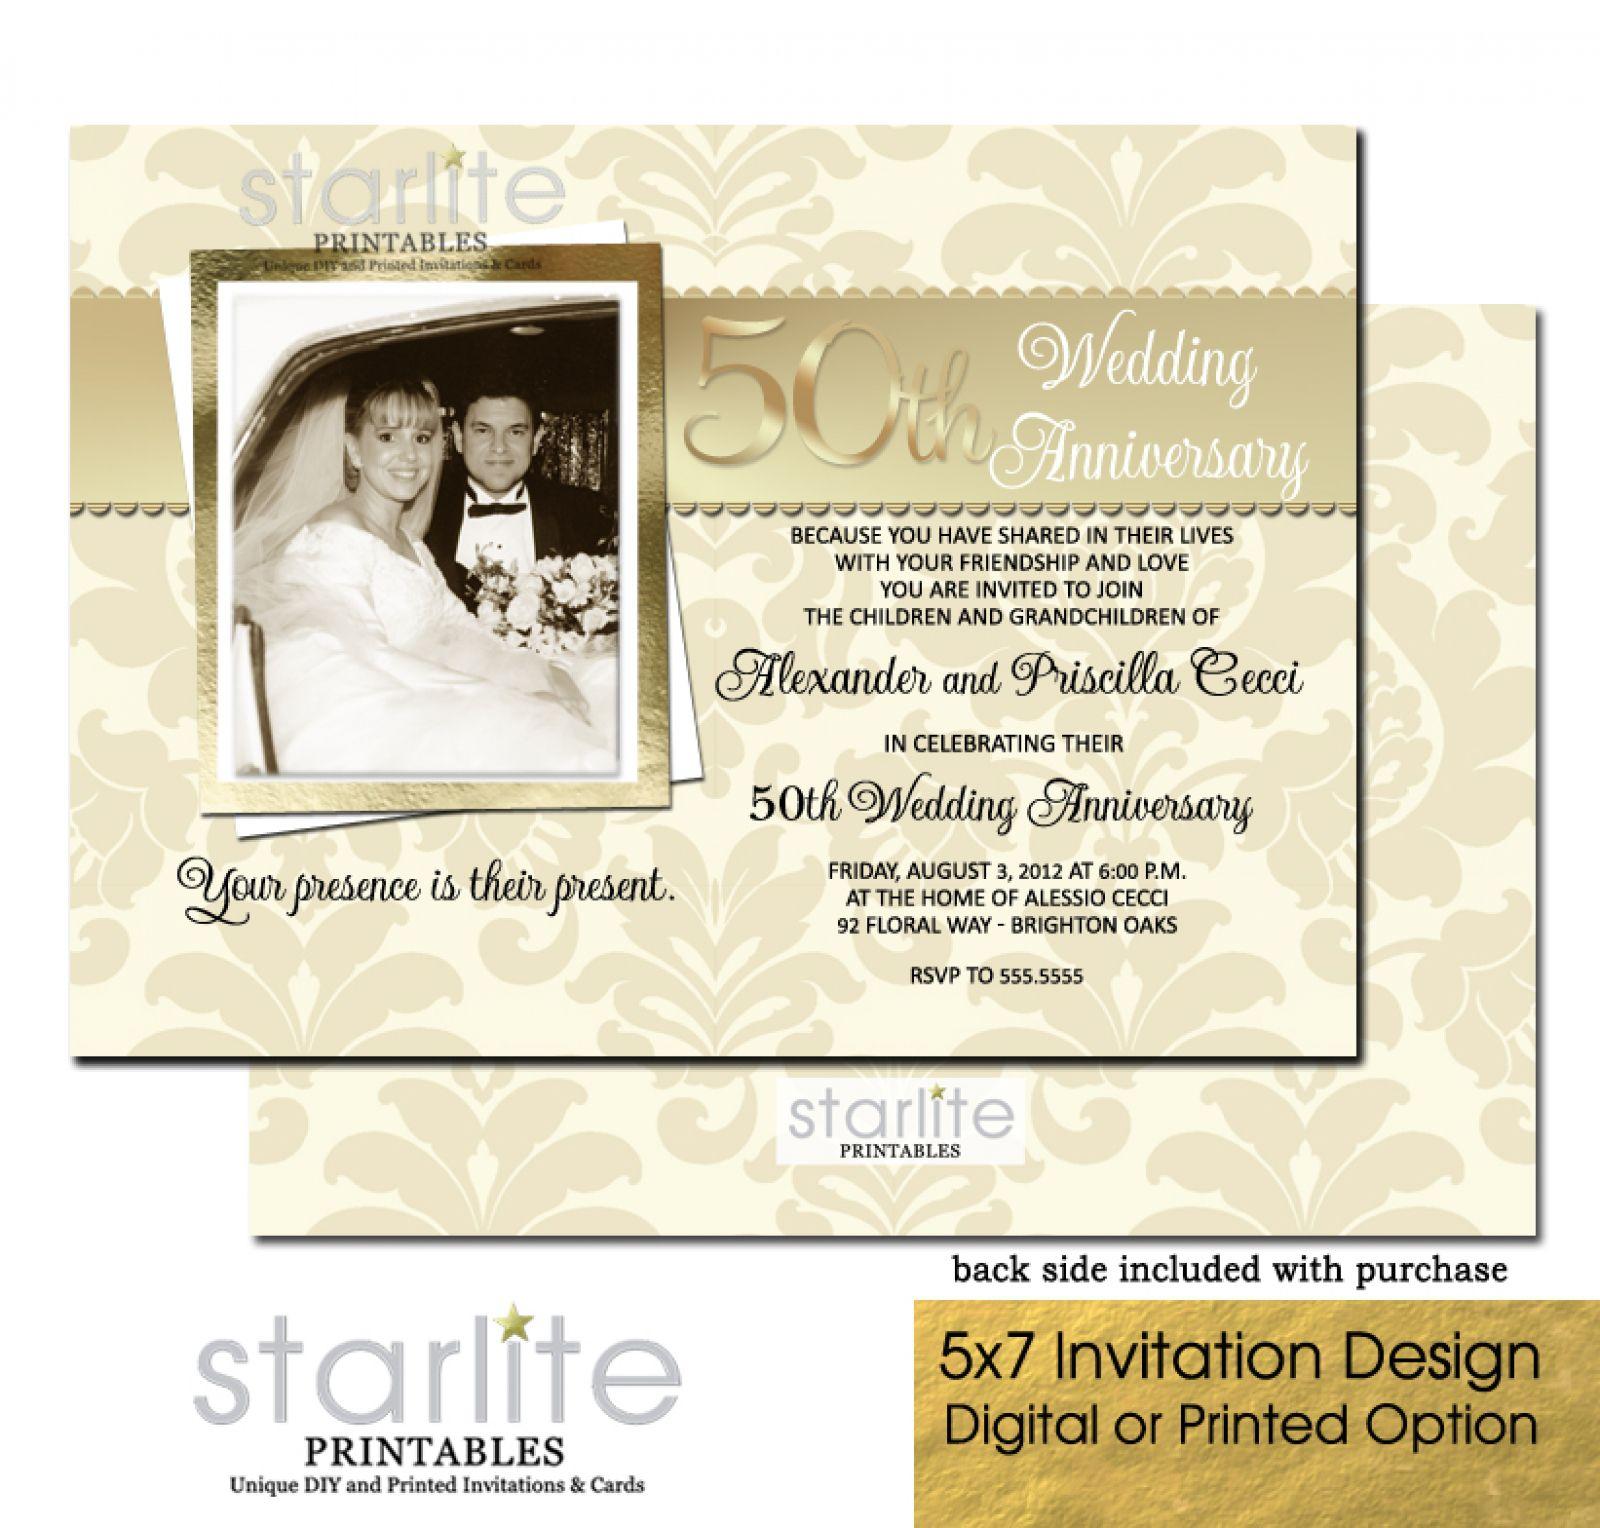 007 Impressive 50th Wedding Anniversary Invitation Design Example  Designs Wording Sample Card Template Free DownloadFull